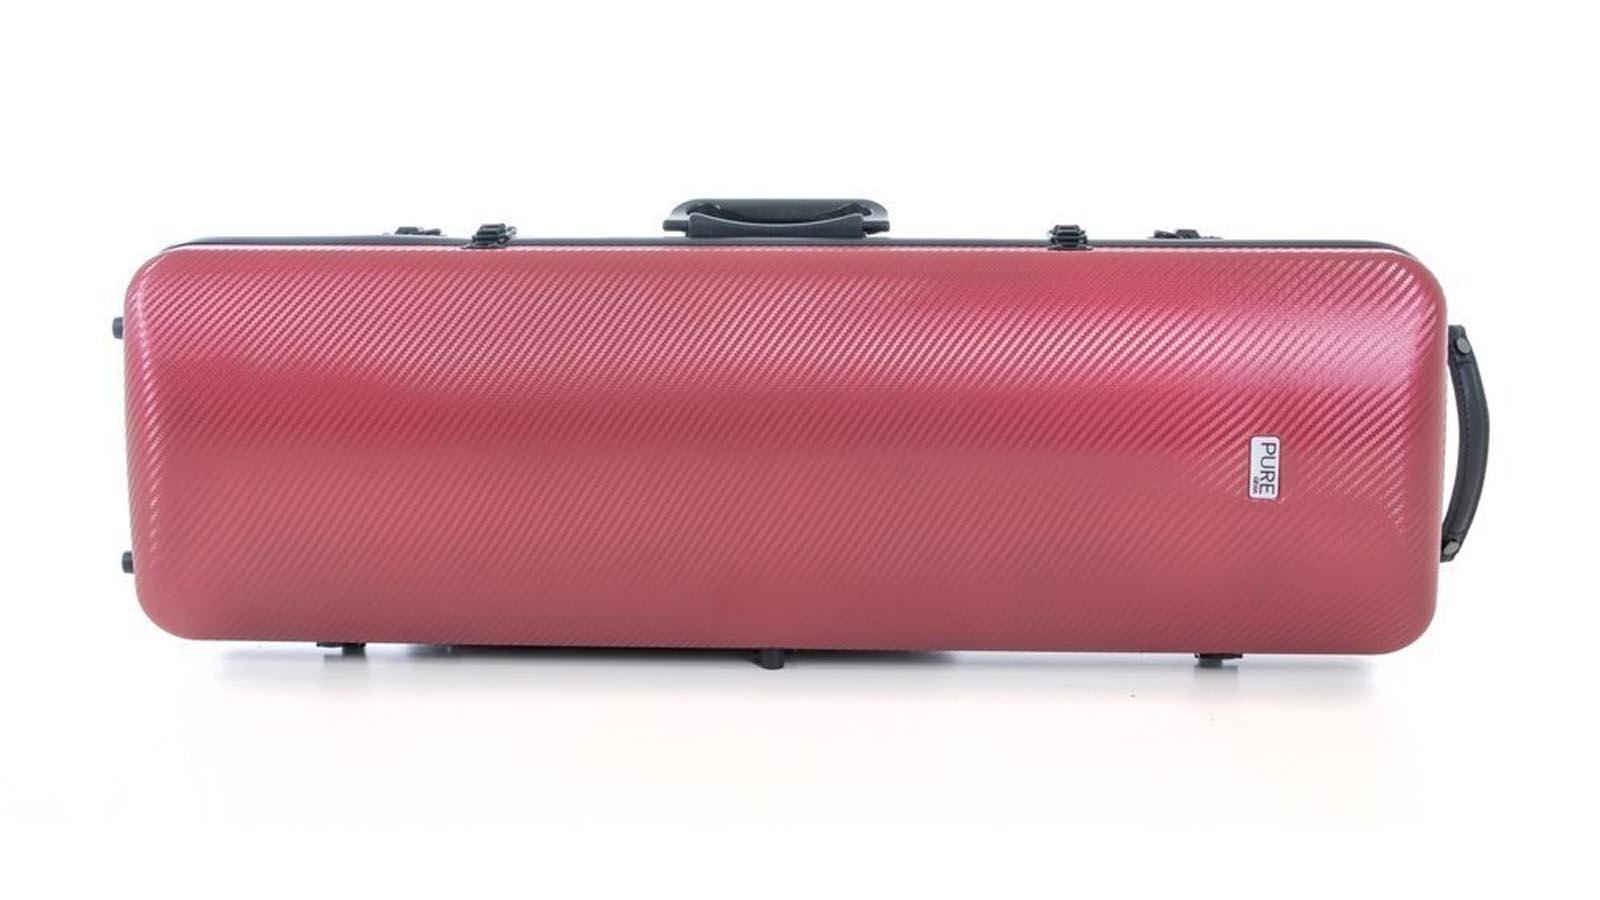 Gewa Violinkoffer Polycyrbonat Rot/Schwarz